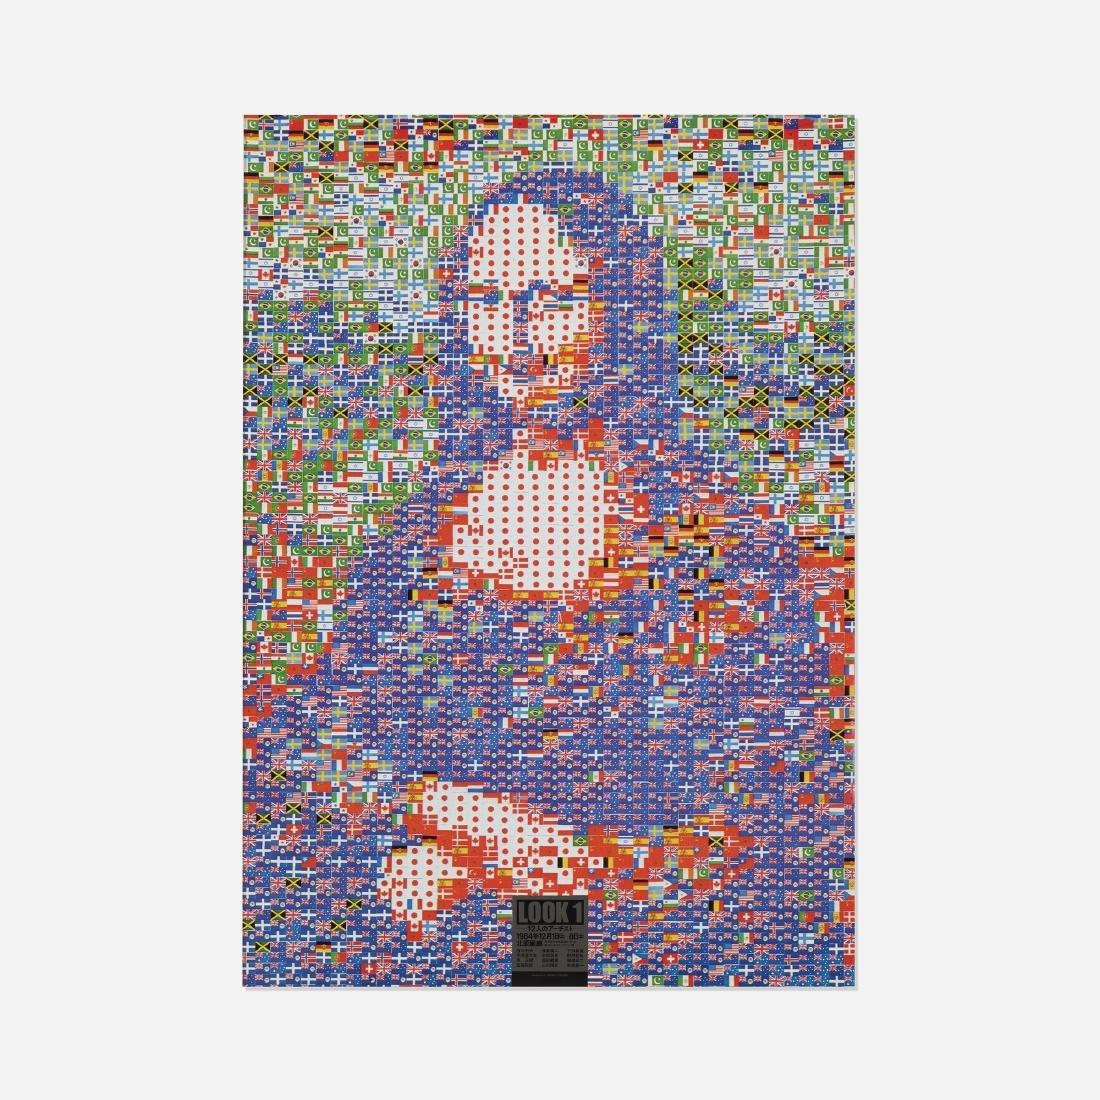 Shigeo Fukuda, Look 1 (Mona Lisa) poster